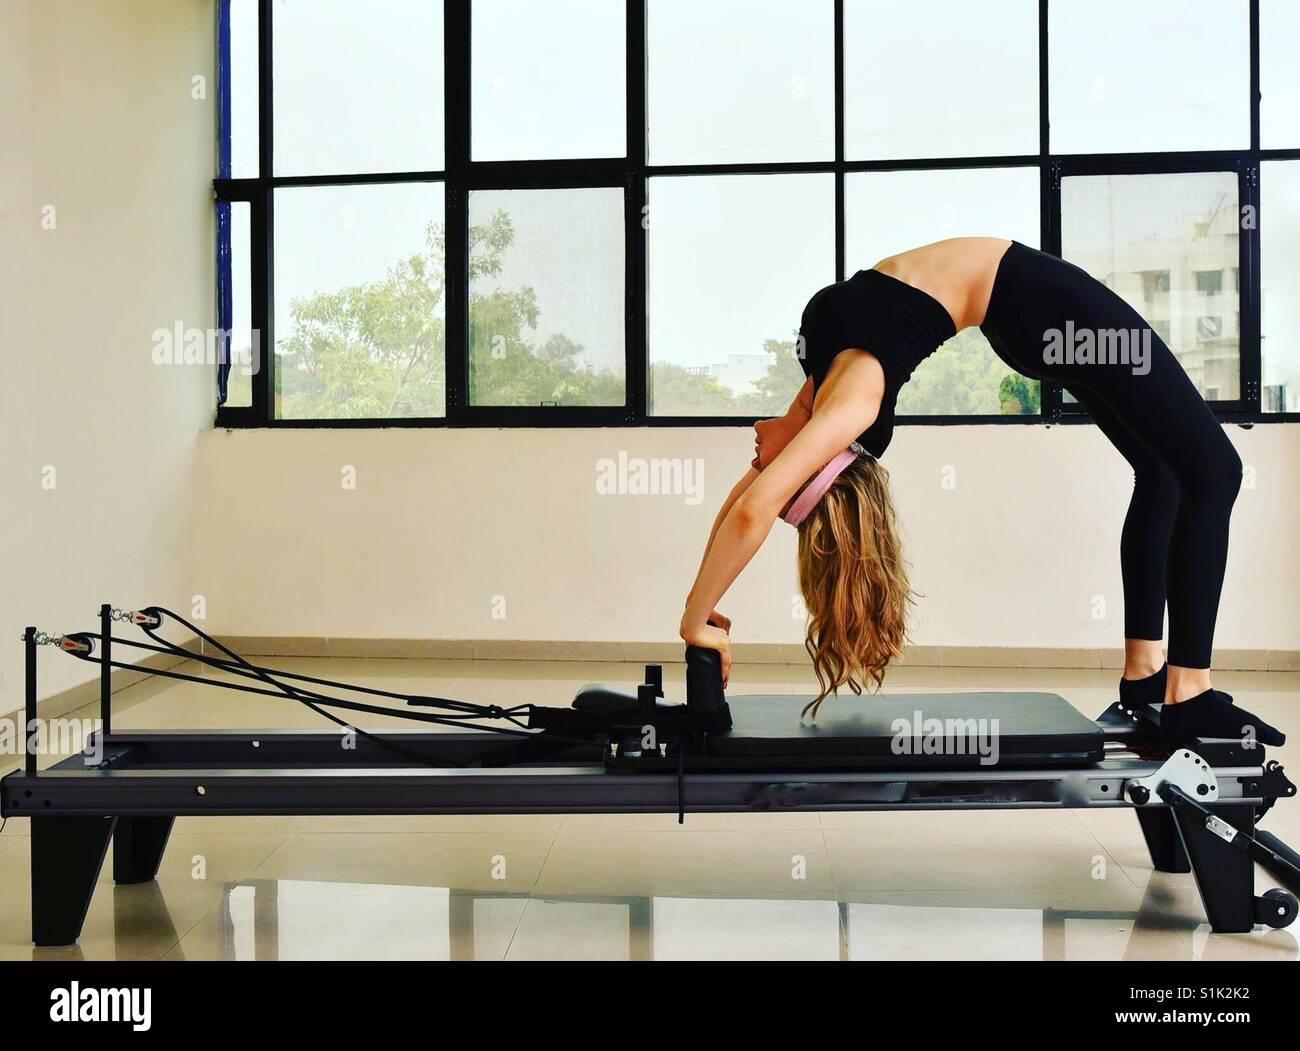 Pilates reformer flexibility bridge - Stock Image